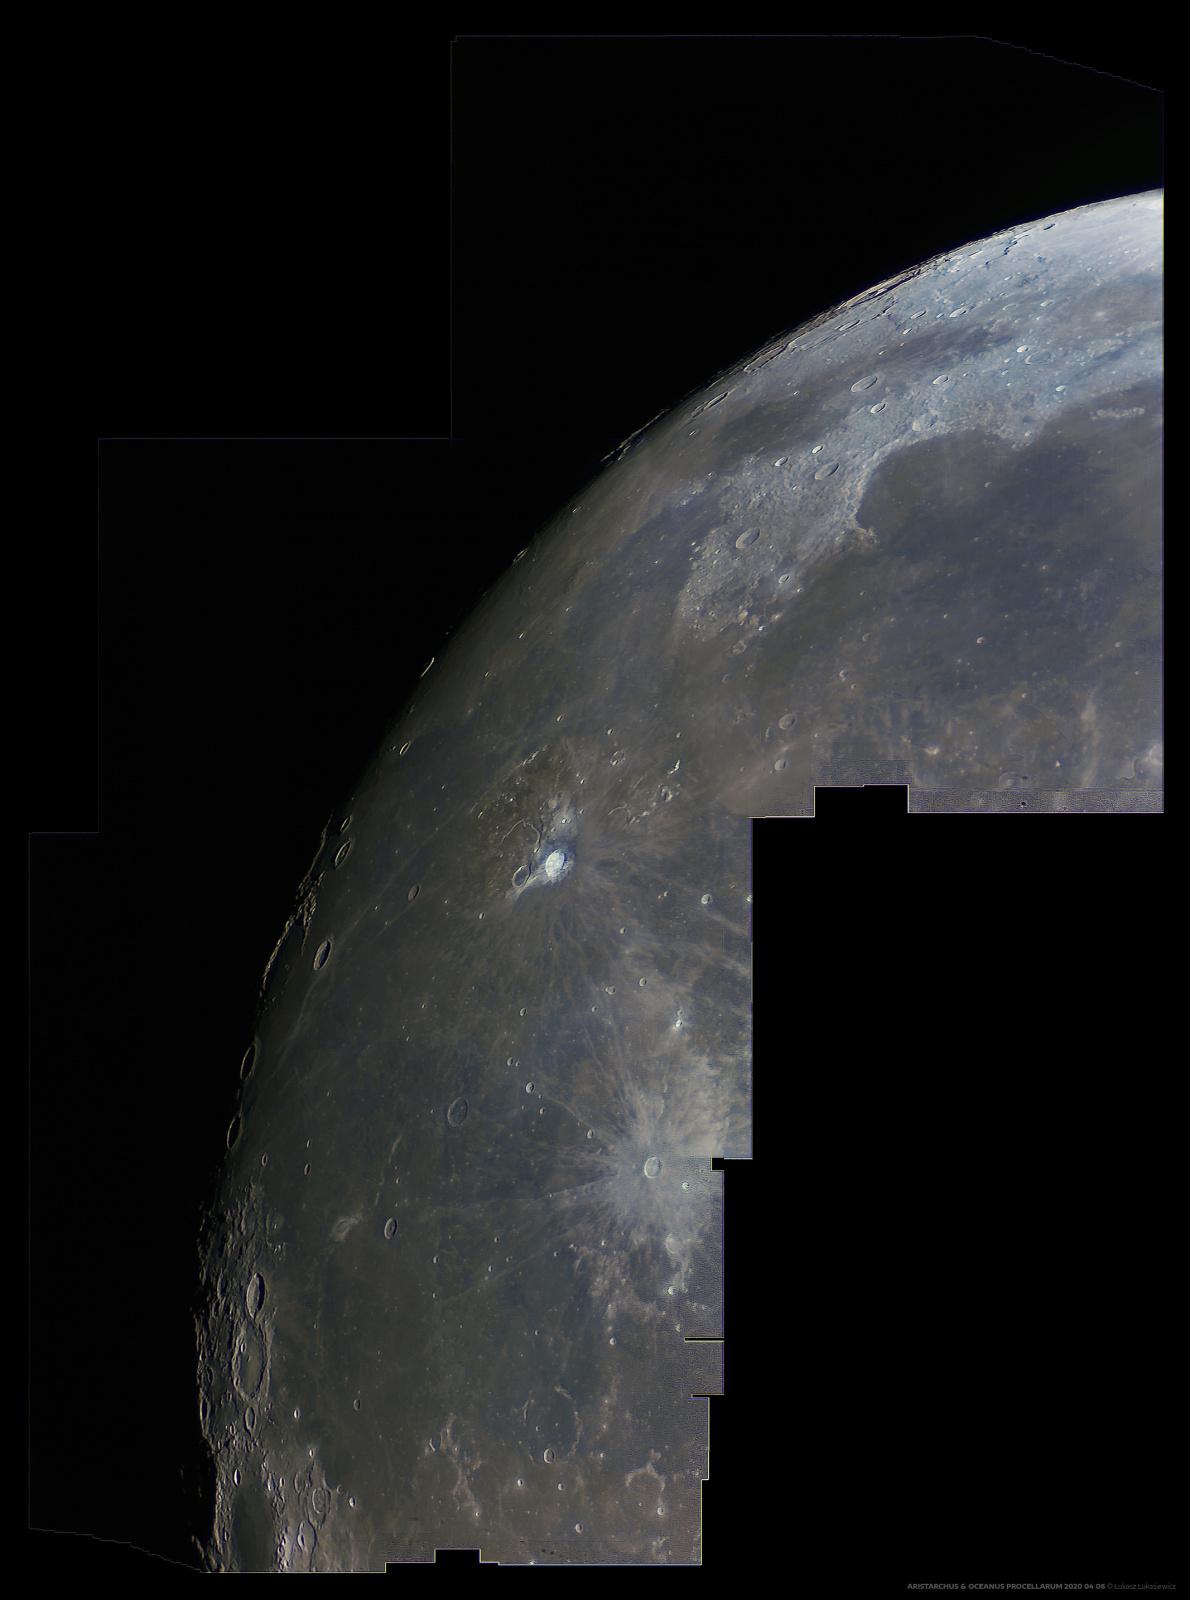 538767898_ARISTARCHUS--OCEANUS-PROCELLARUM-2020-04-06.thumb.jpg.efa30b2a1a76db3609638d1cc35214e2.jpg